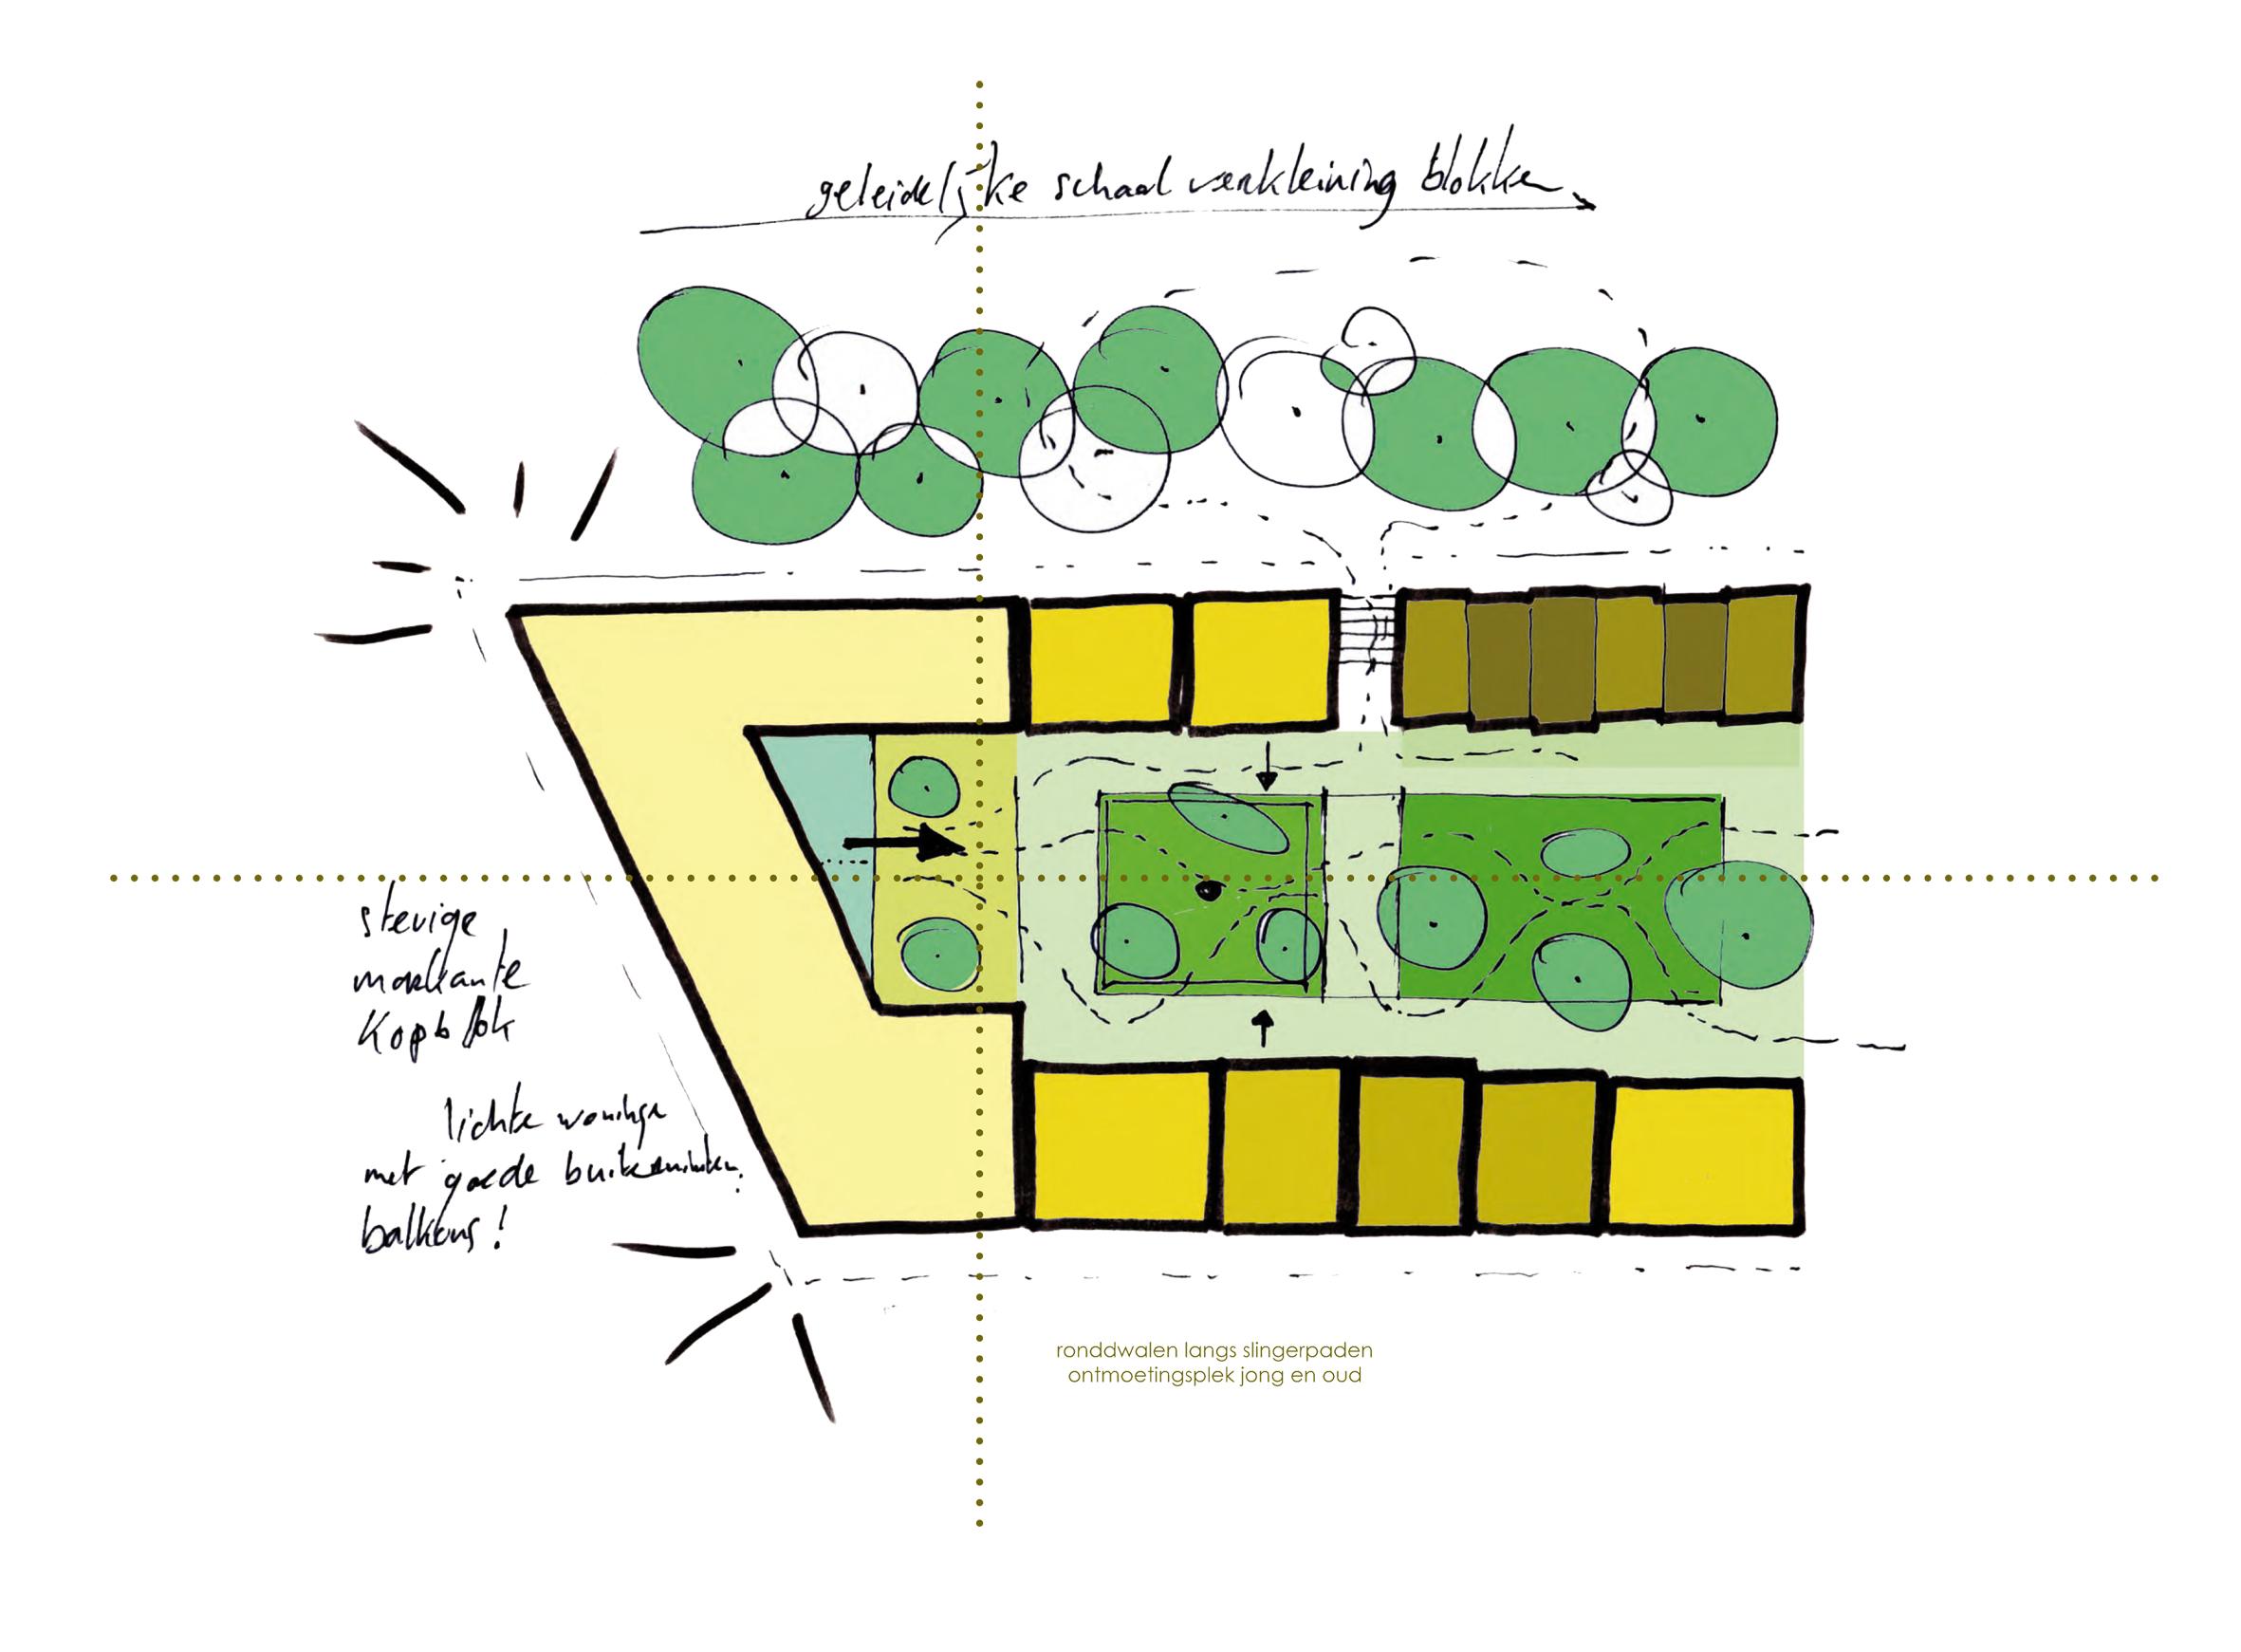 Delft concept schets